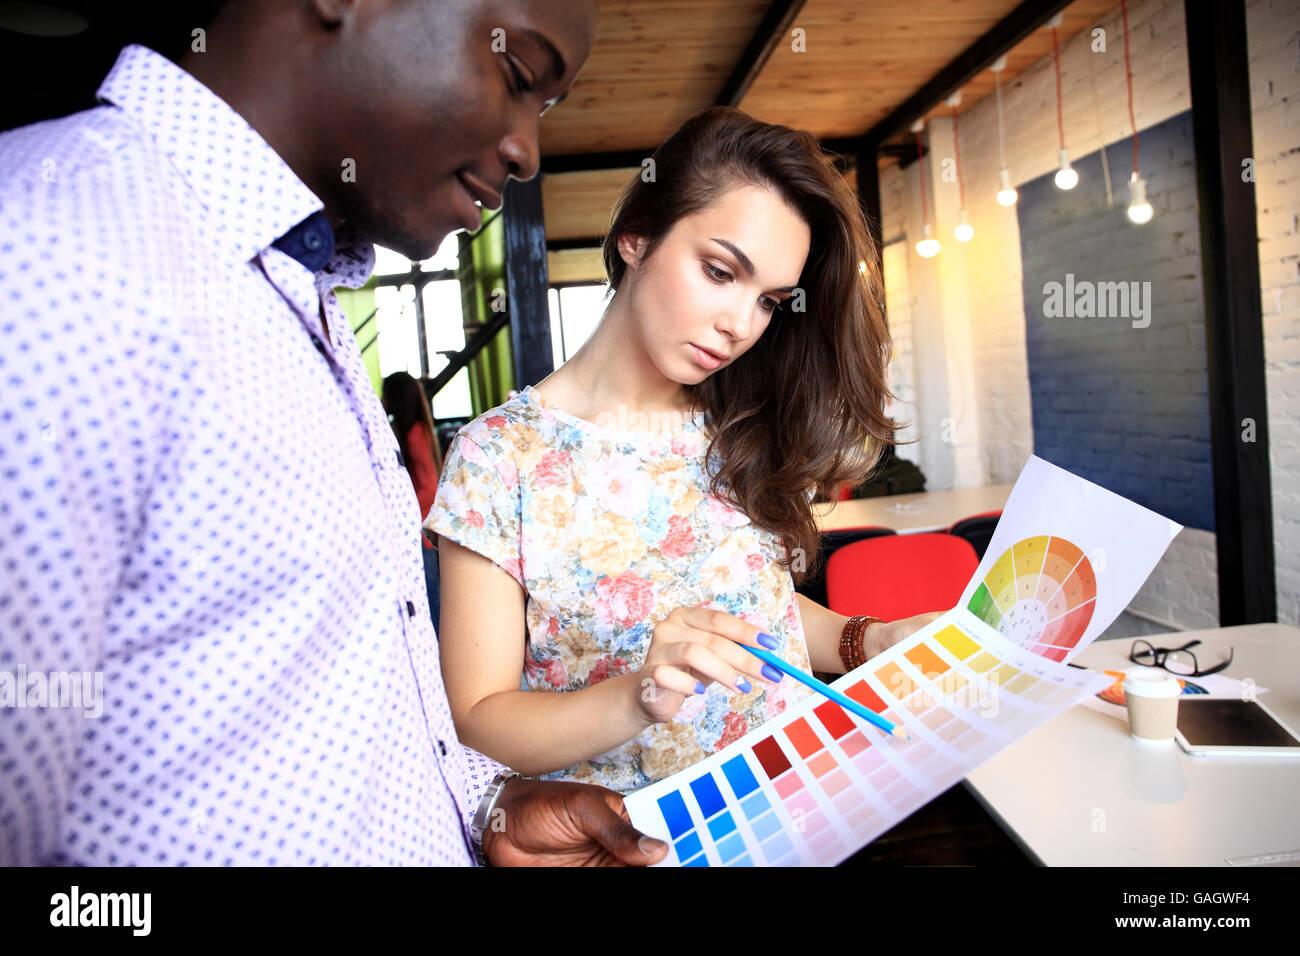 Group of Multiethnic Designers Brainstorming - Stock Image